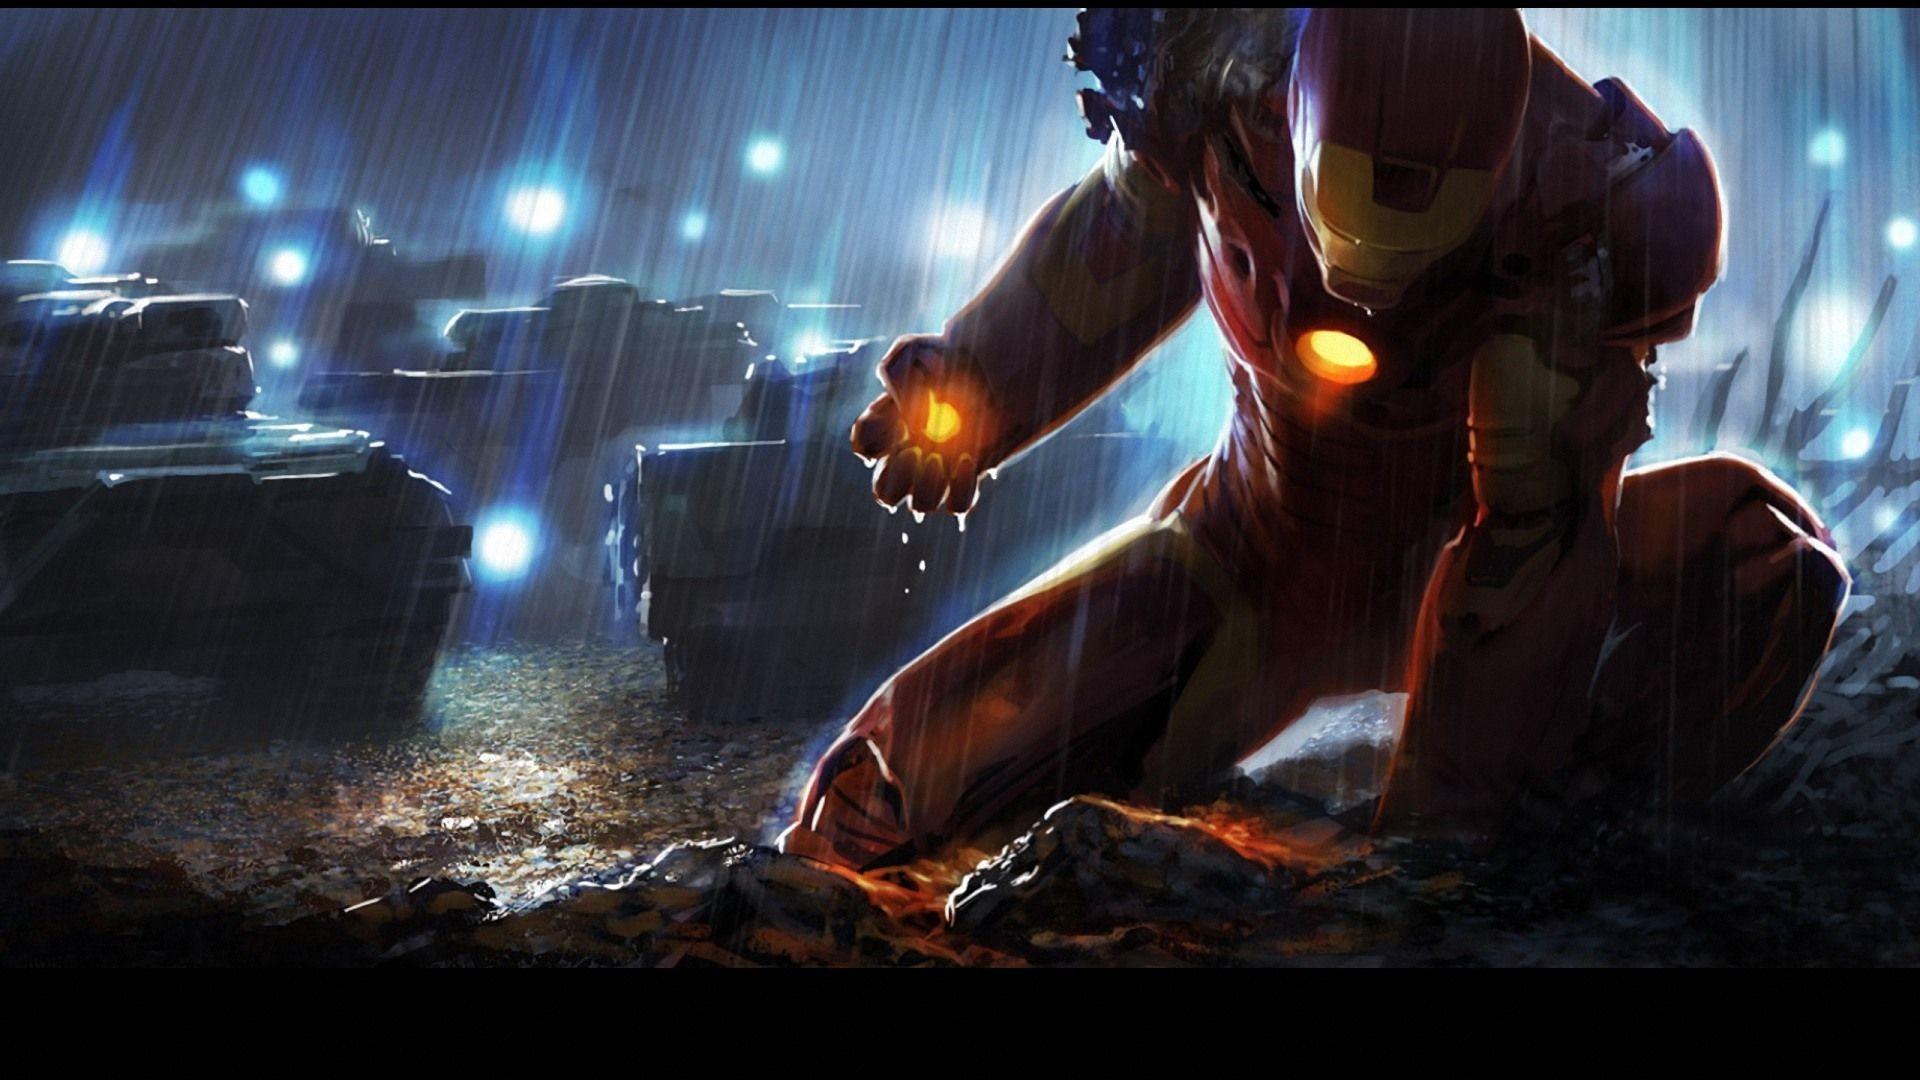 Iron Man Best HTC One wallpapers | HD Wallpapers | Pinterest | Hd wallpaper,  Iron man wallpaper and Man wallpaper